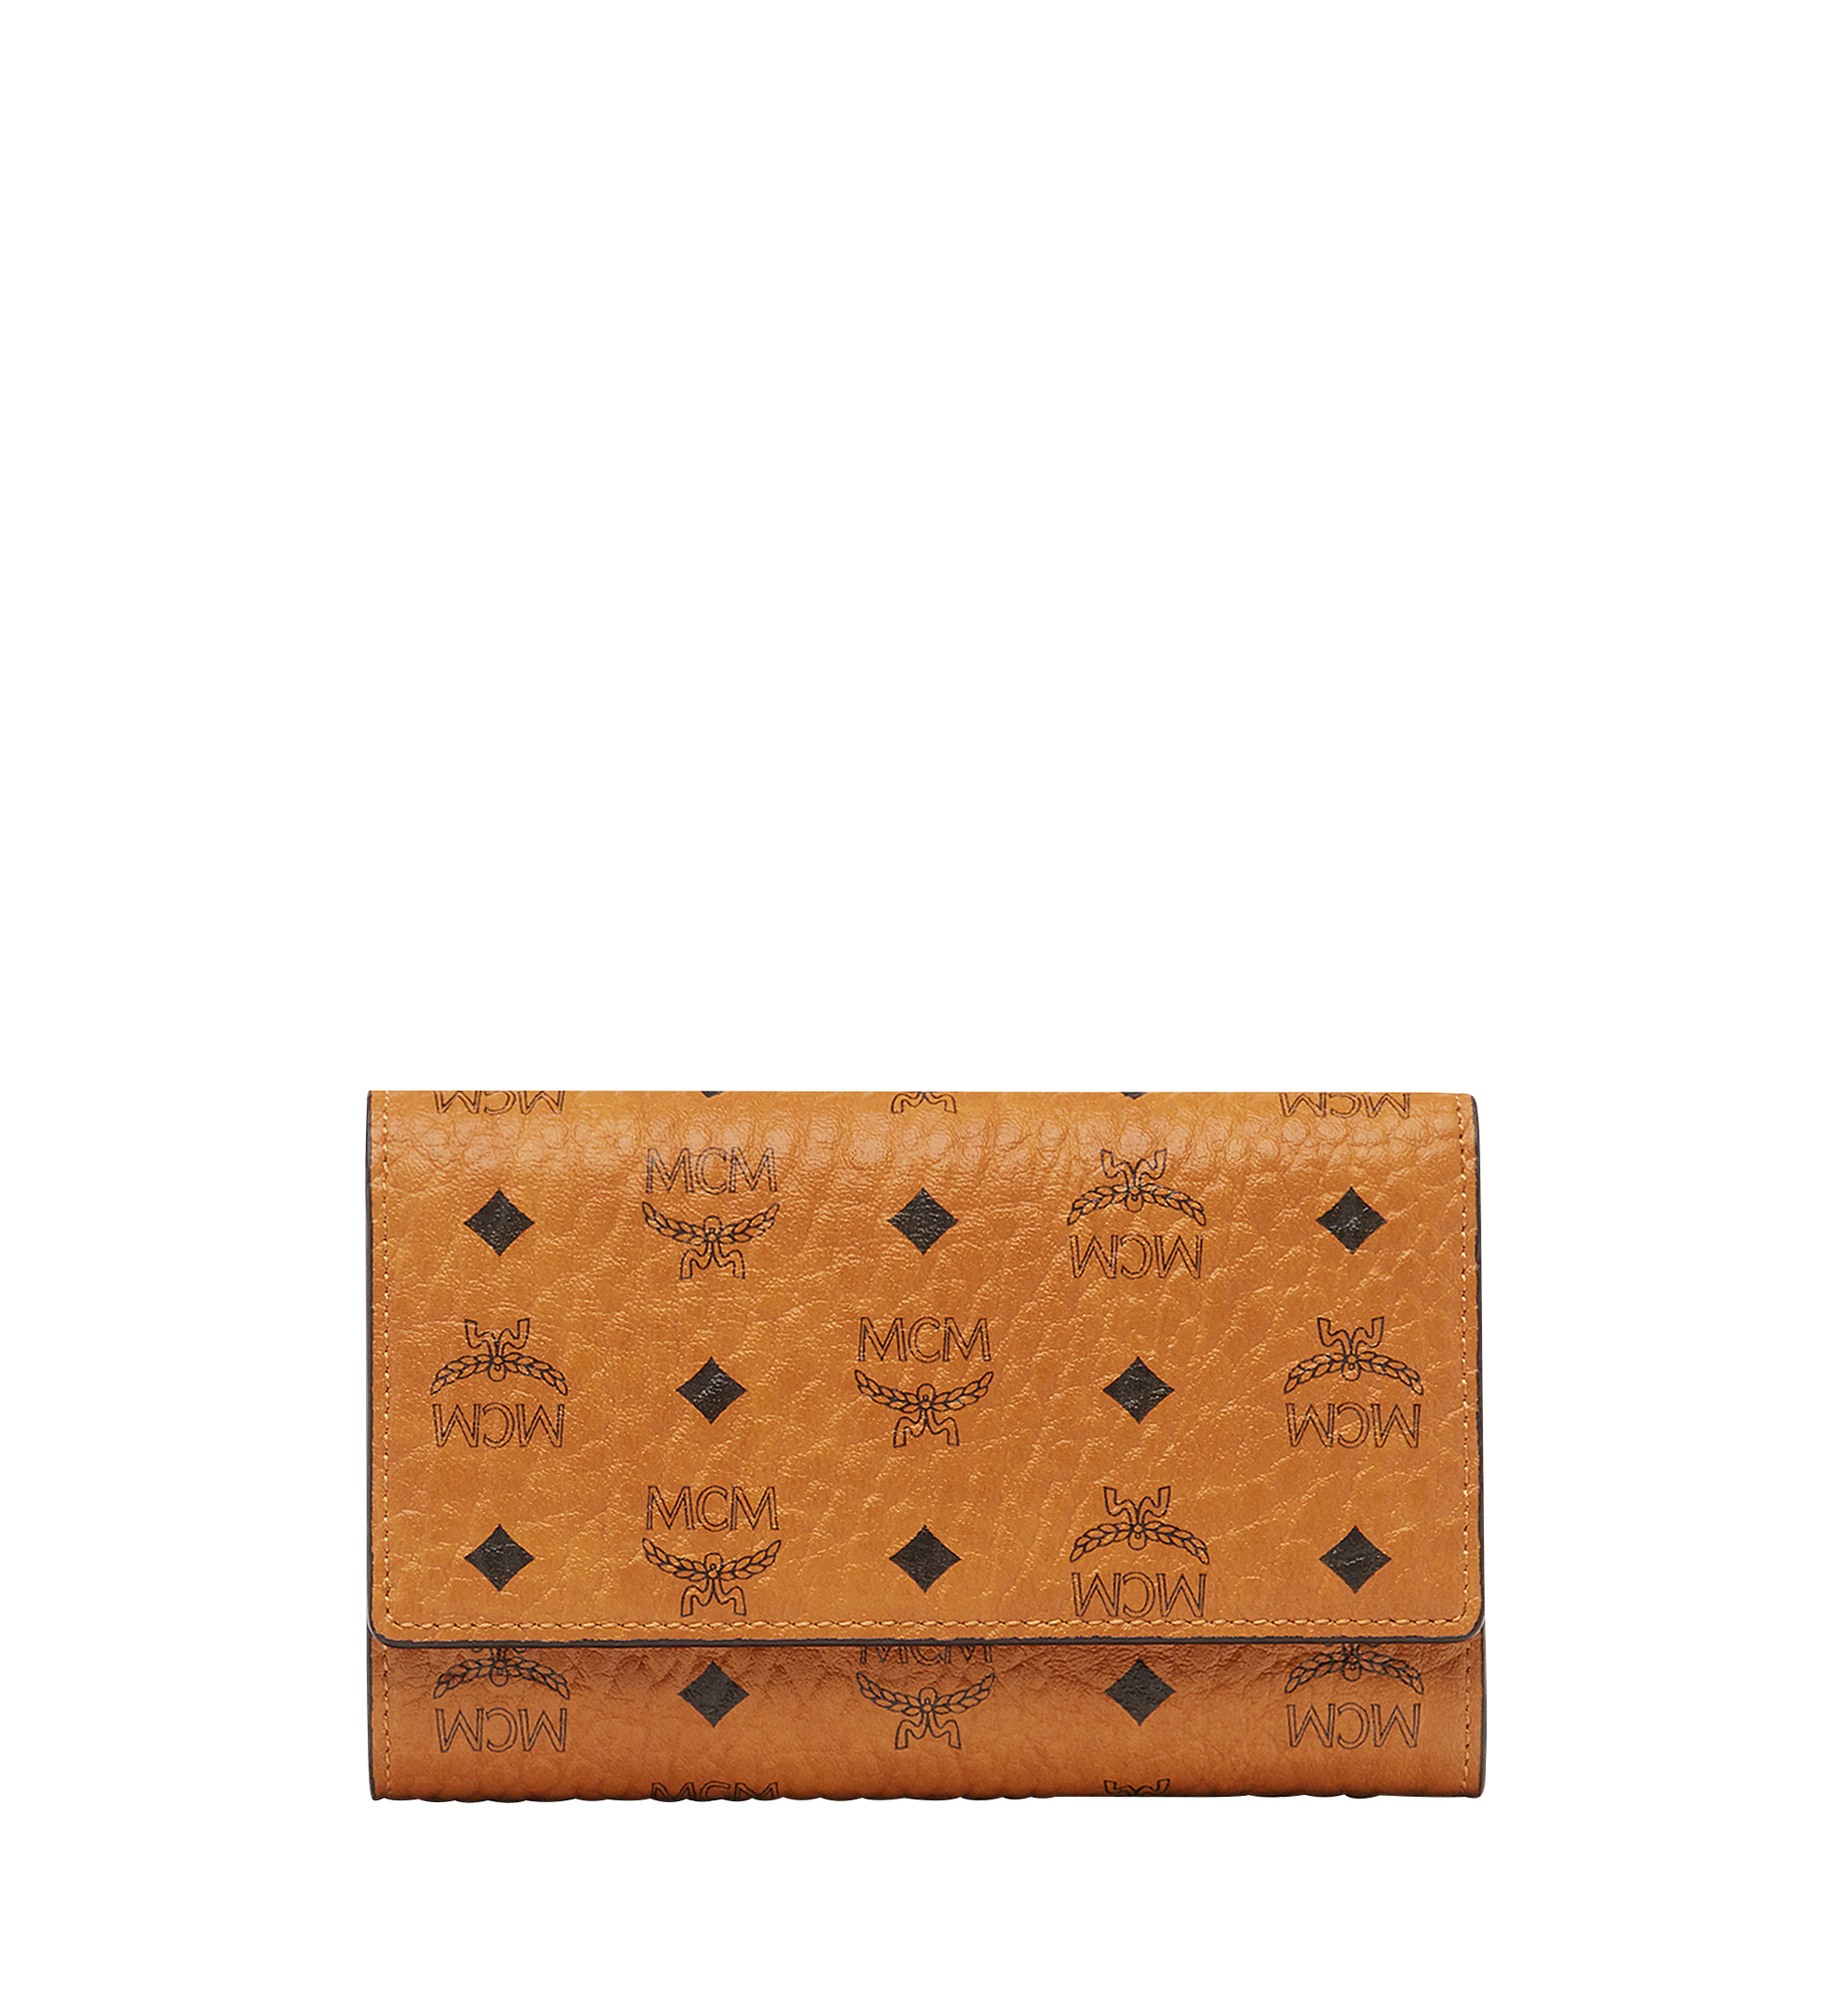 MCM Three Fold Wallet in Visetos Original Cognac MYM8SVI49CO001 更多视角 1